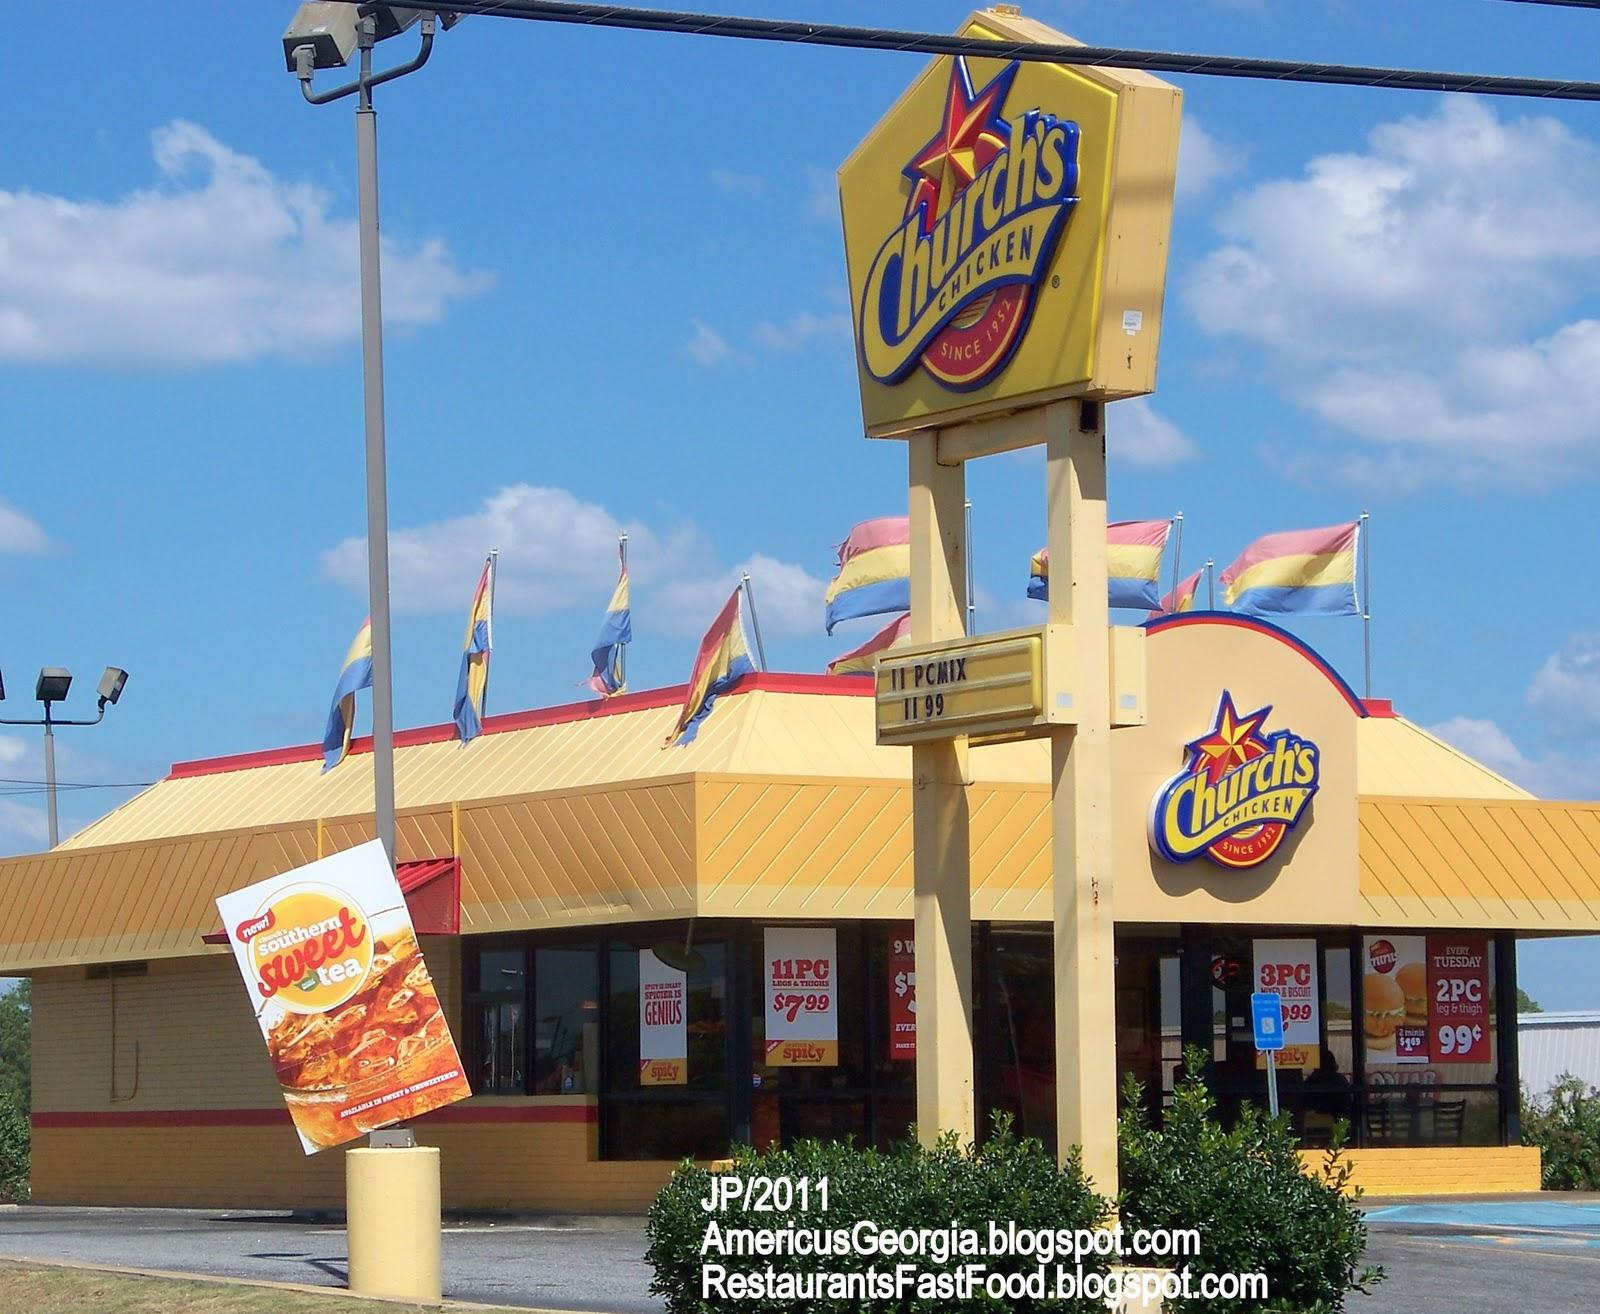 Church S En Americus Georgia Fried Fast Food Restaurant Sumter County Ga Regular Or Y